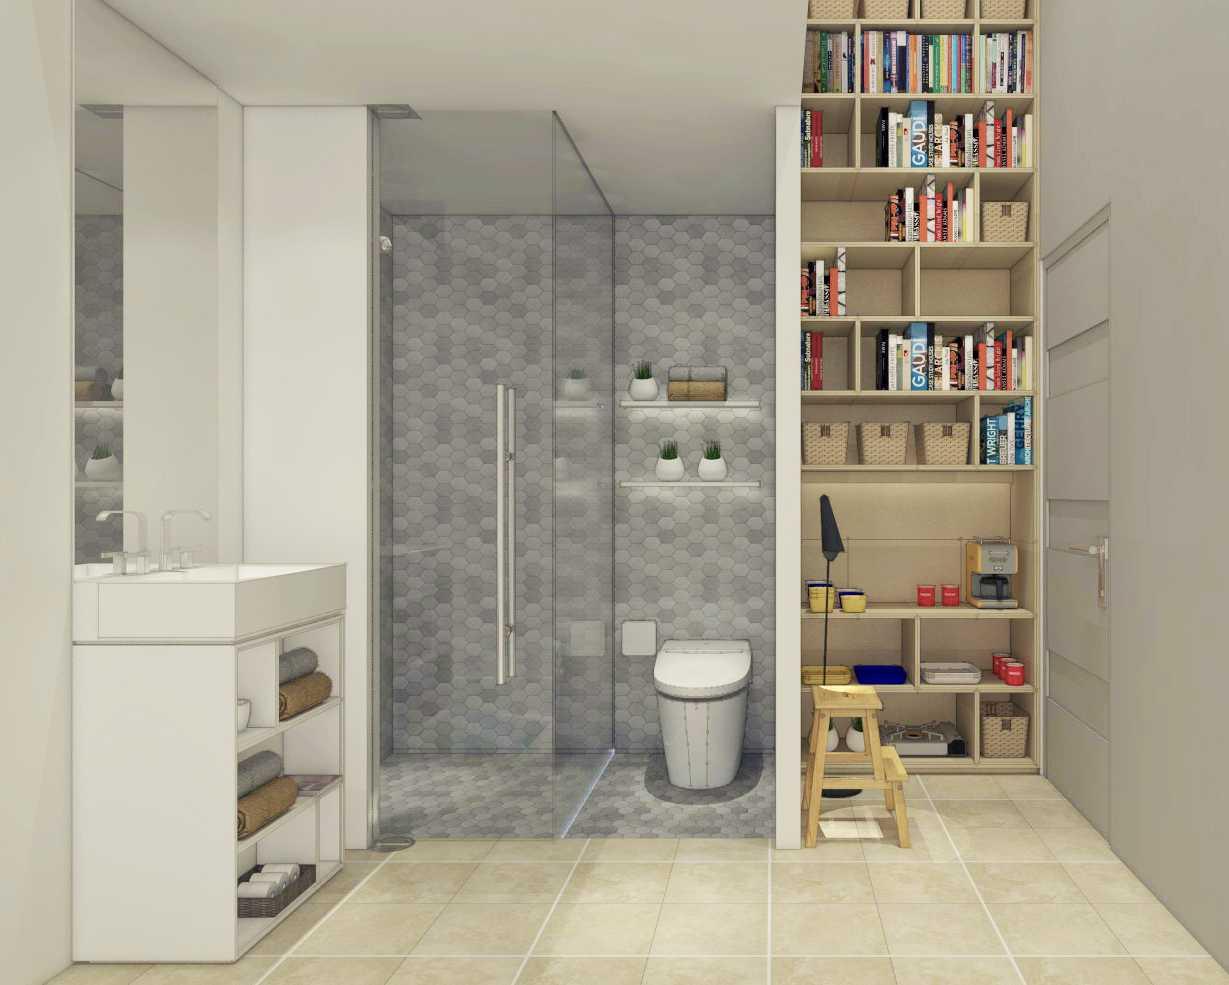 Ari Wibowo Design (Aw.d) 3X3 Loft Jakarta Jakarta Bathroom Modern 11312